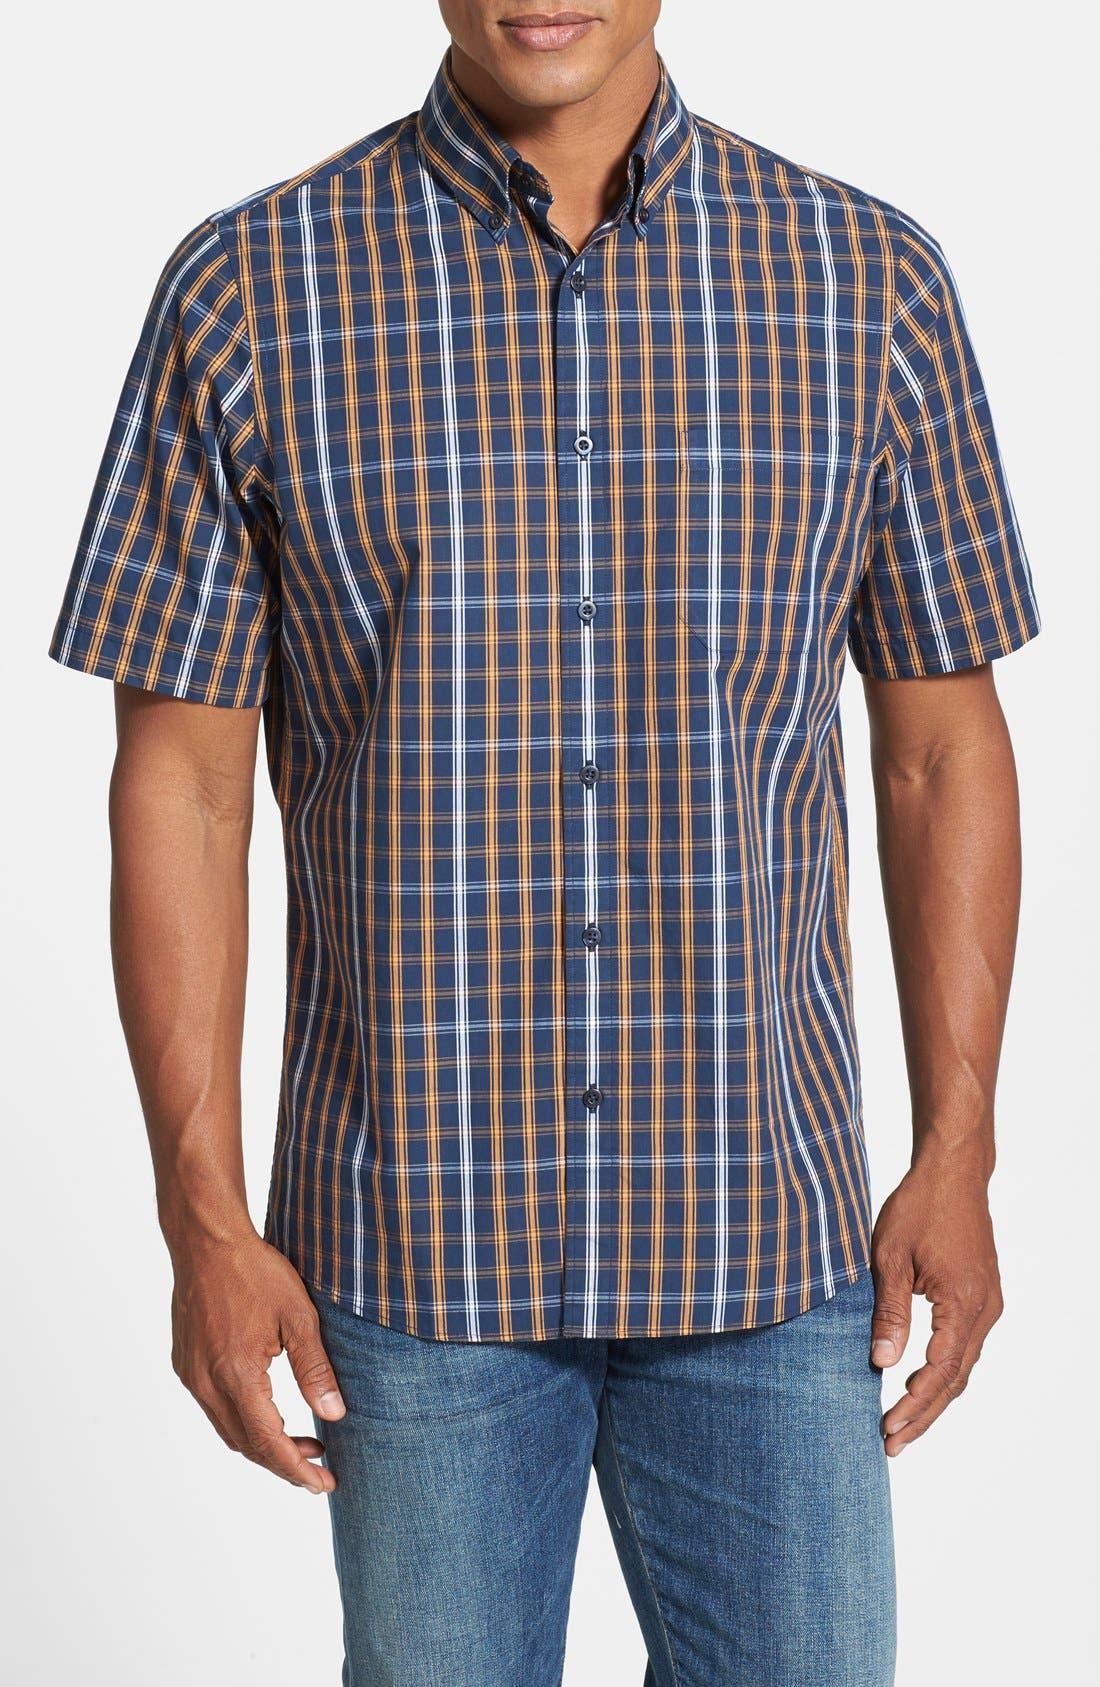 Main Image - Nordstrom Short Sleeve Woven Sport Shirt